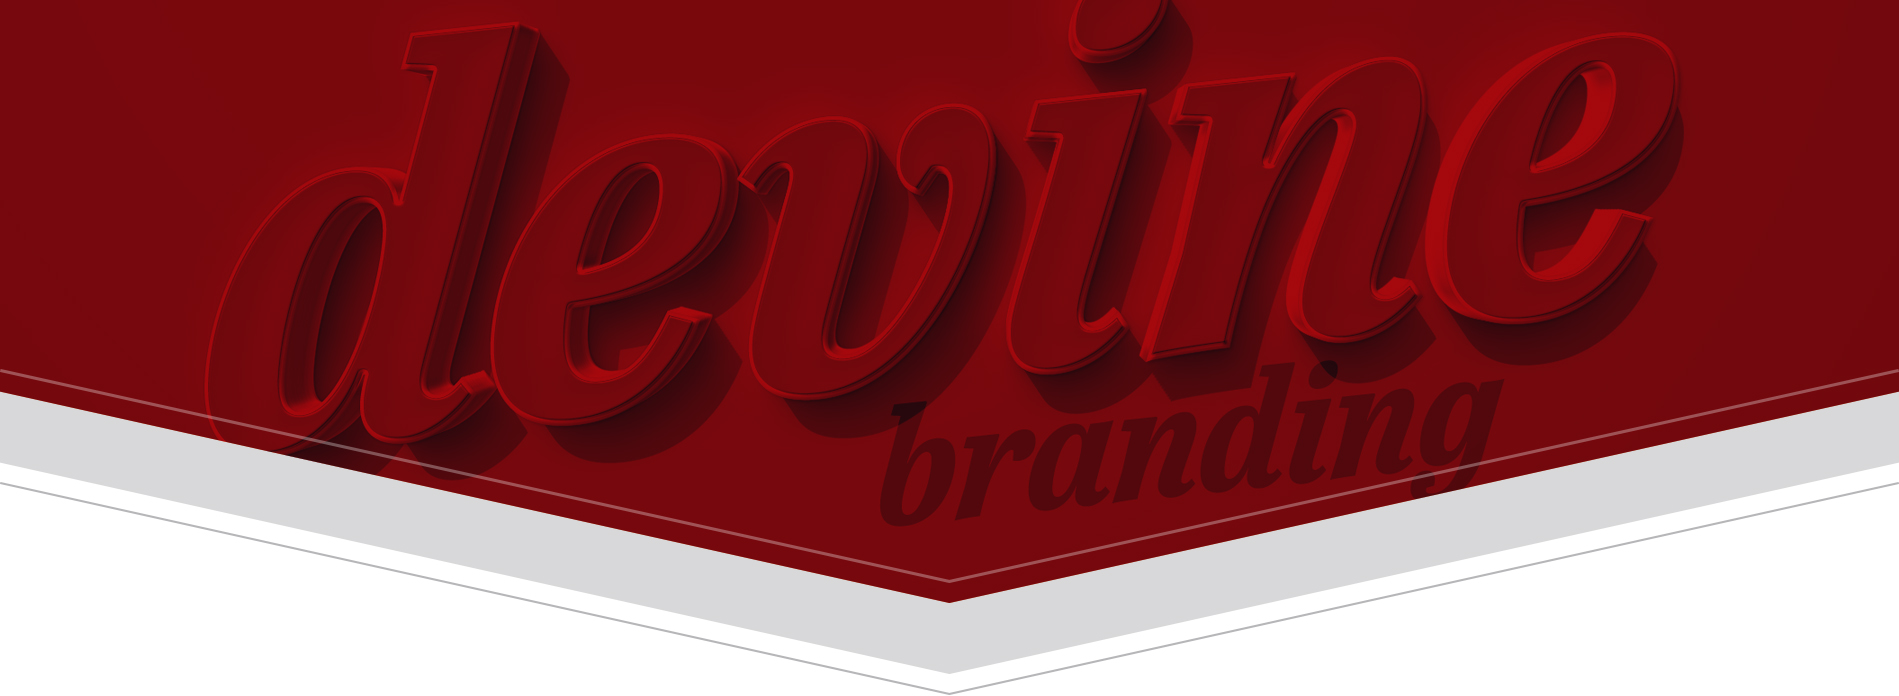 Devine Branding   Stunning Design & Marketing Strategy Services.    Let's get started